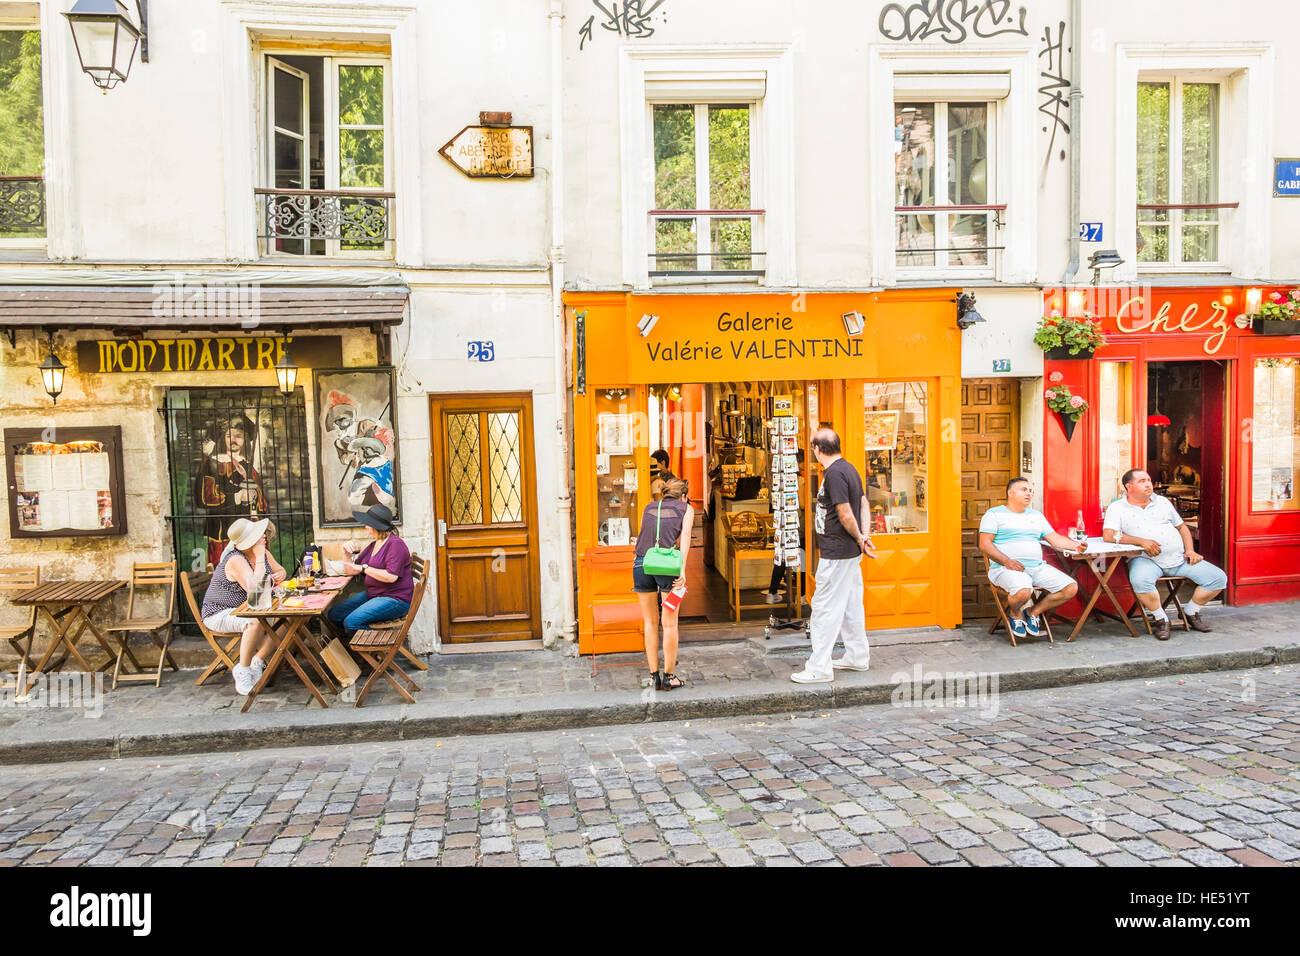 street scene in front of galerie valerie valentini and restaurant chez marie - Stock Image